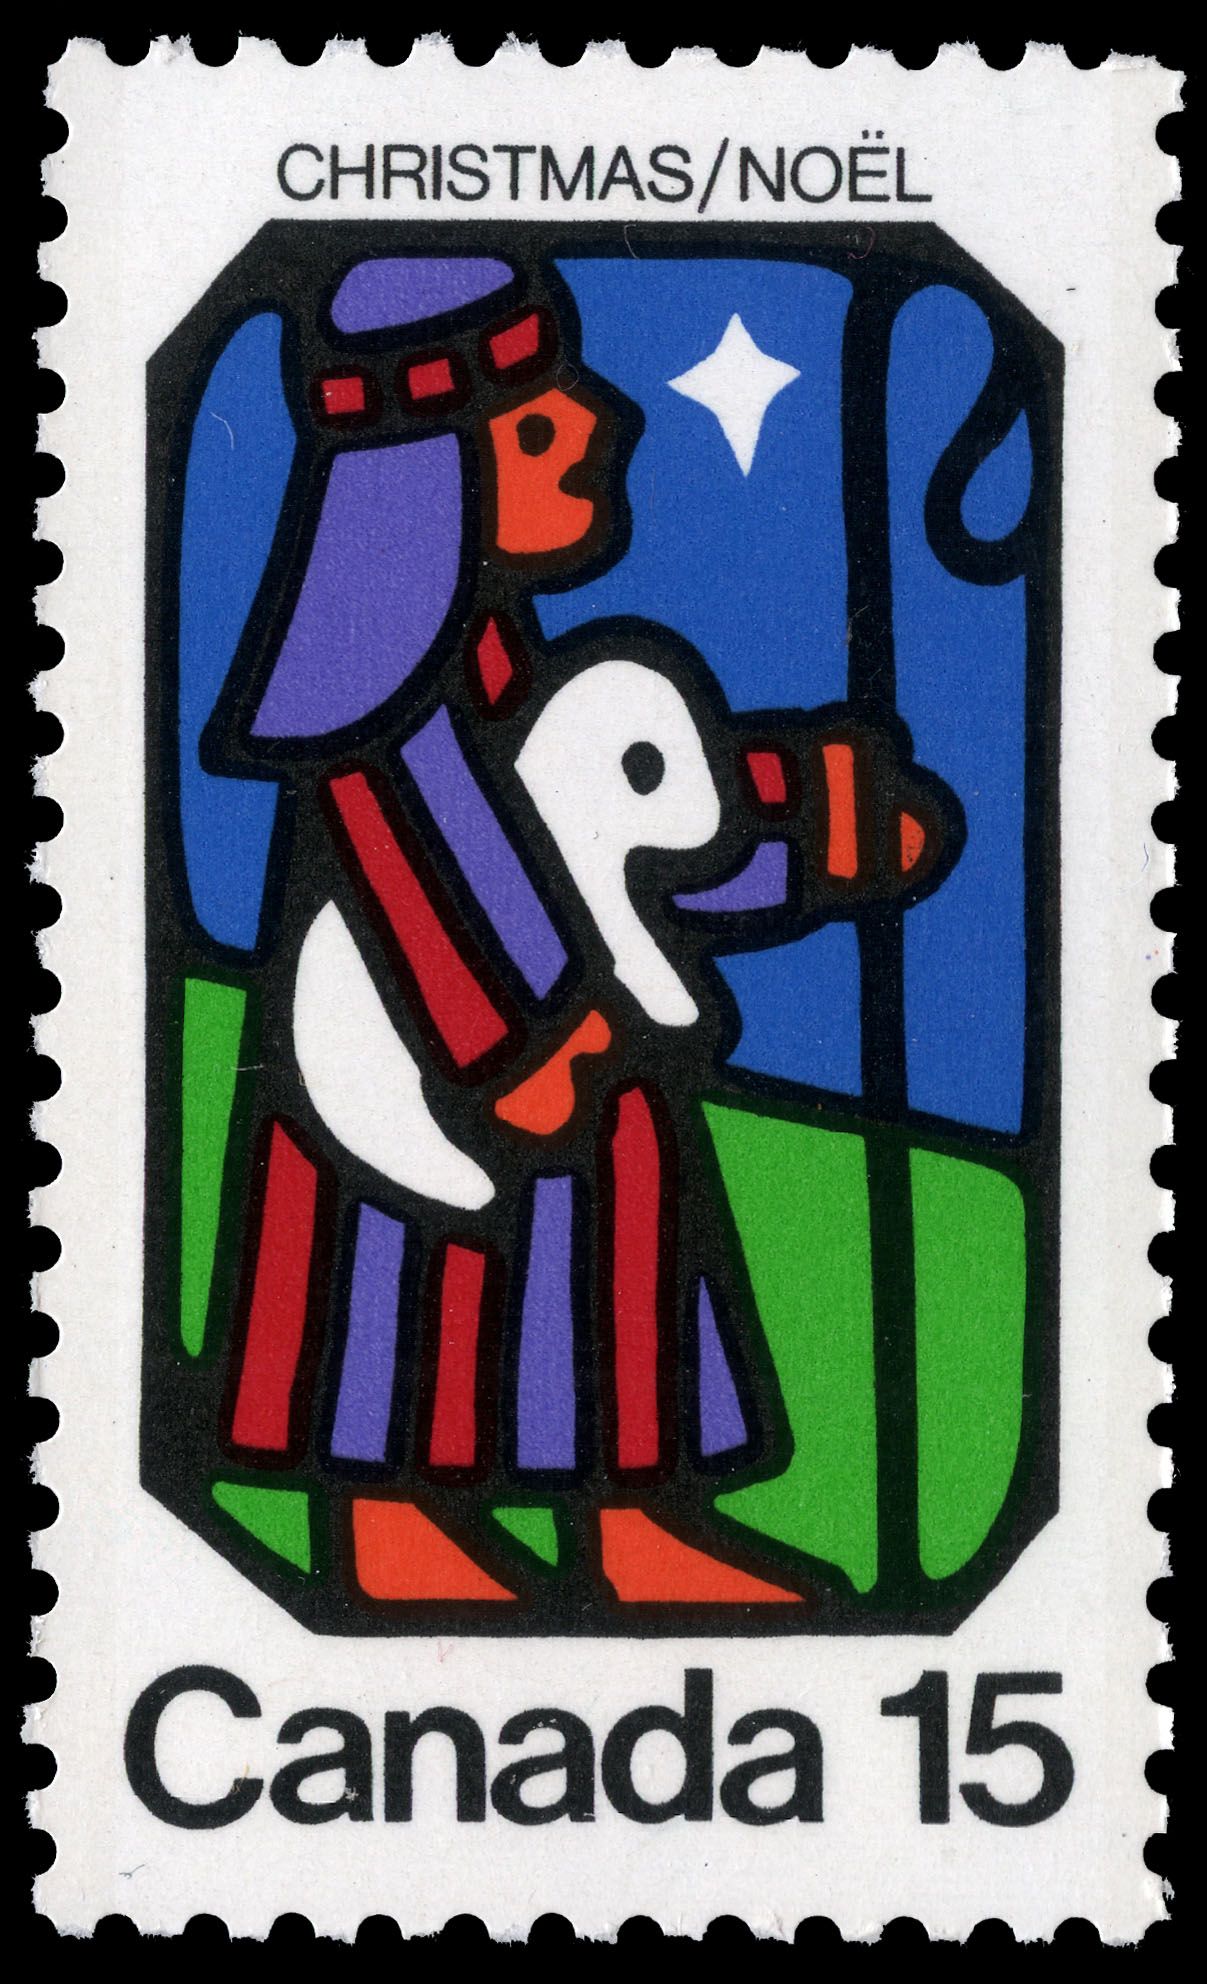 Shepherd Canada Postage Stamp